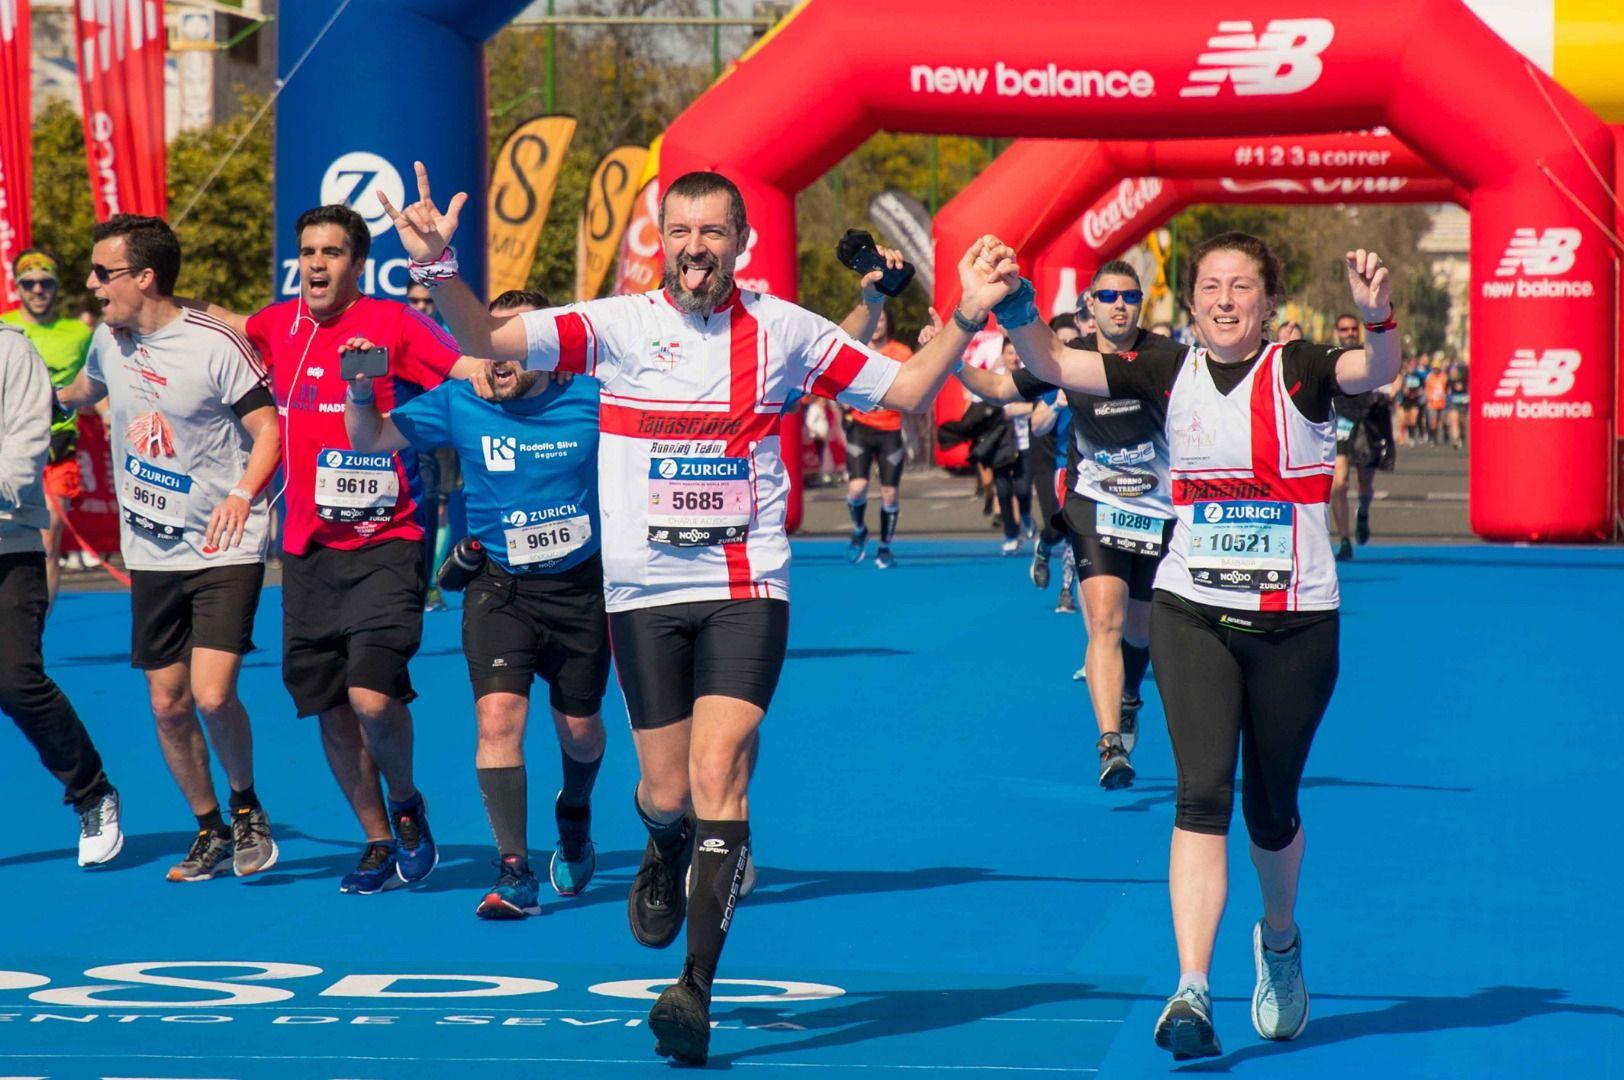 Zurich Maratón de Sevilla 2019